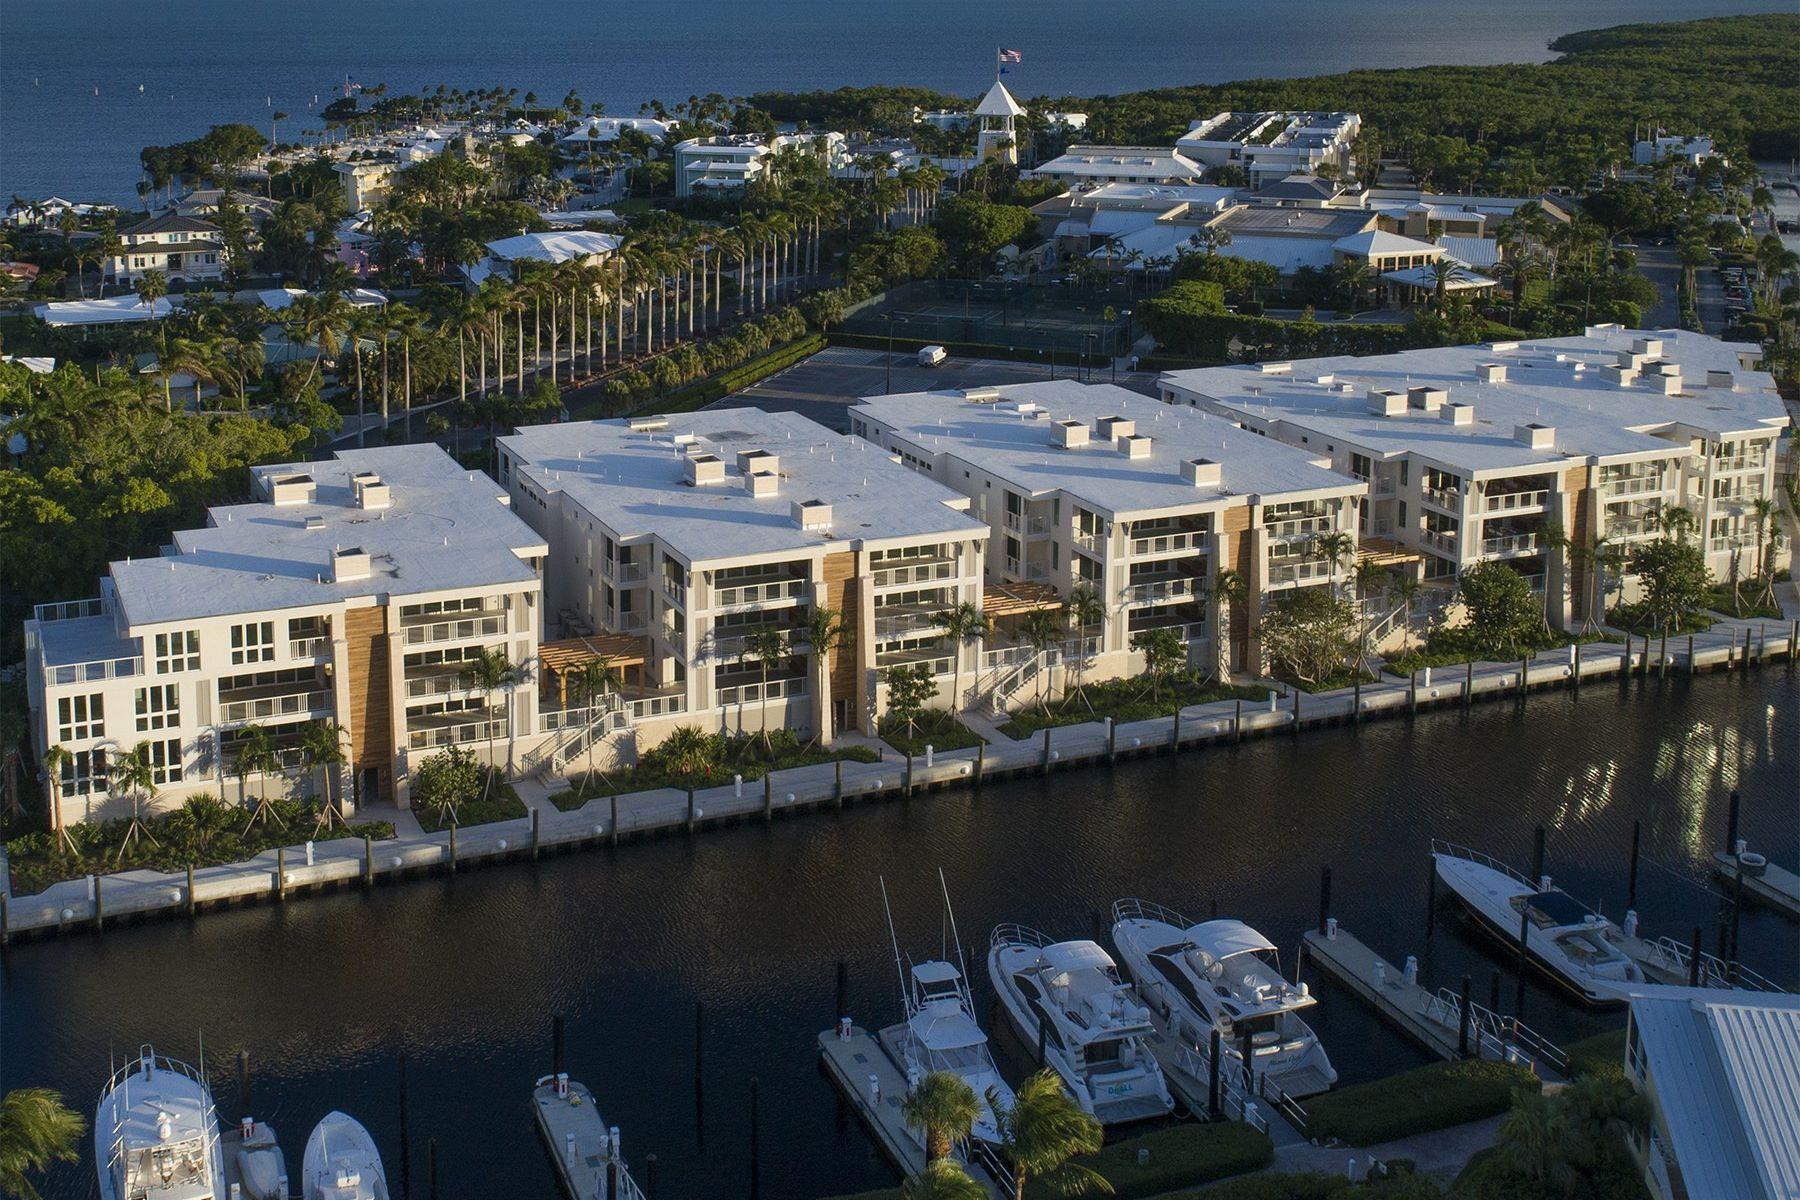 Condominiums for Sale at 111 Beach Road, #208, Key Largo, FL 111 Beach Road, 208, Key Largo, Florida 33037 United States